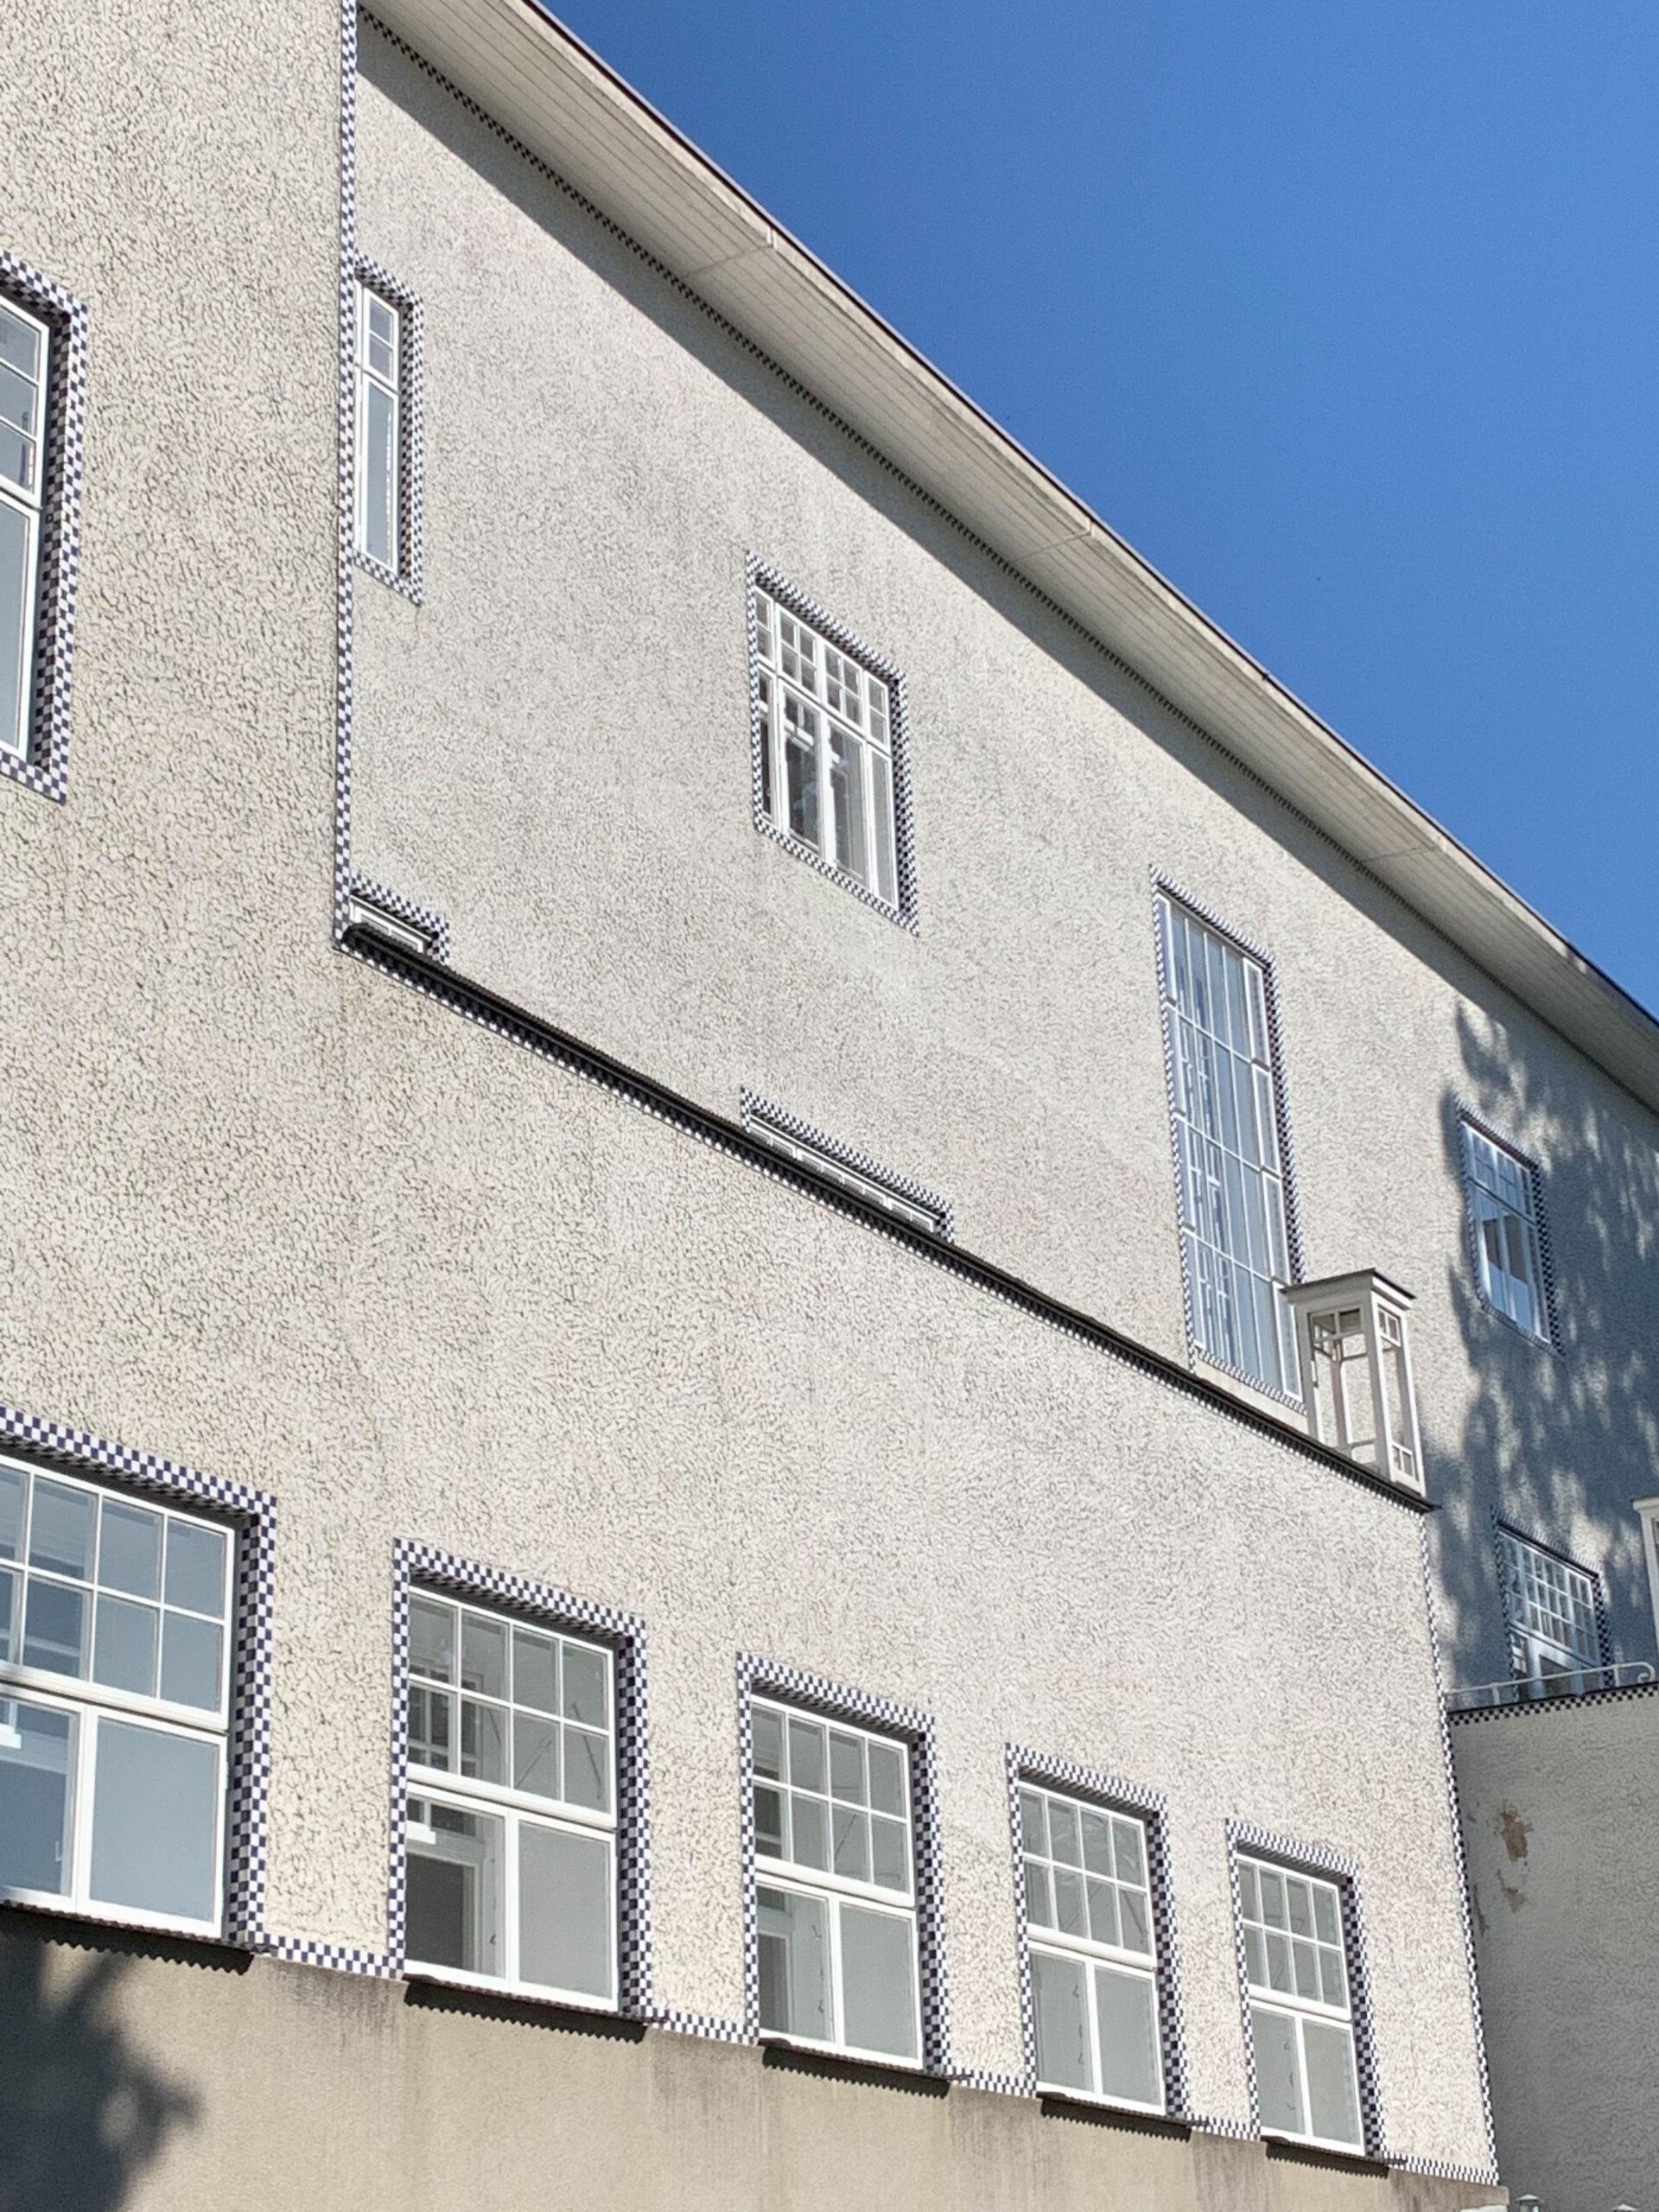 Sanatorium, 1904-1905. Architect: Josef Hoffmann